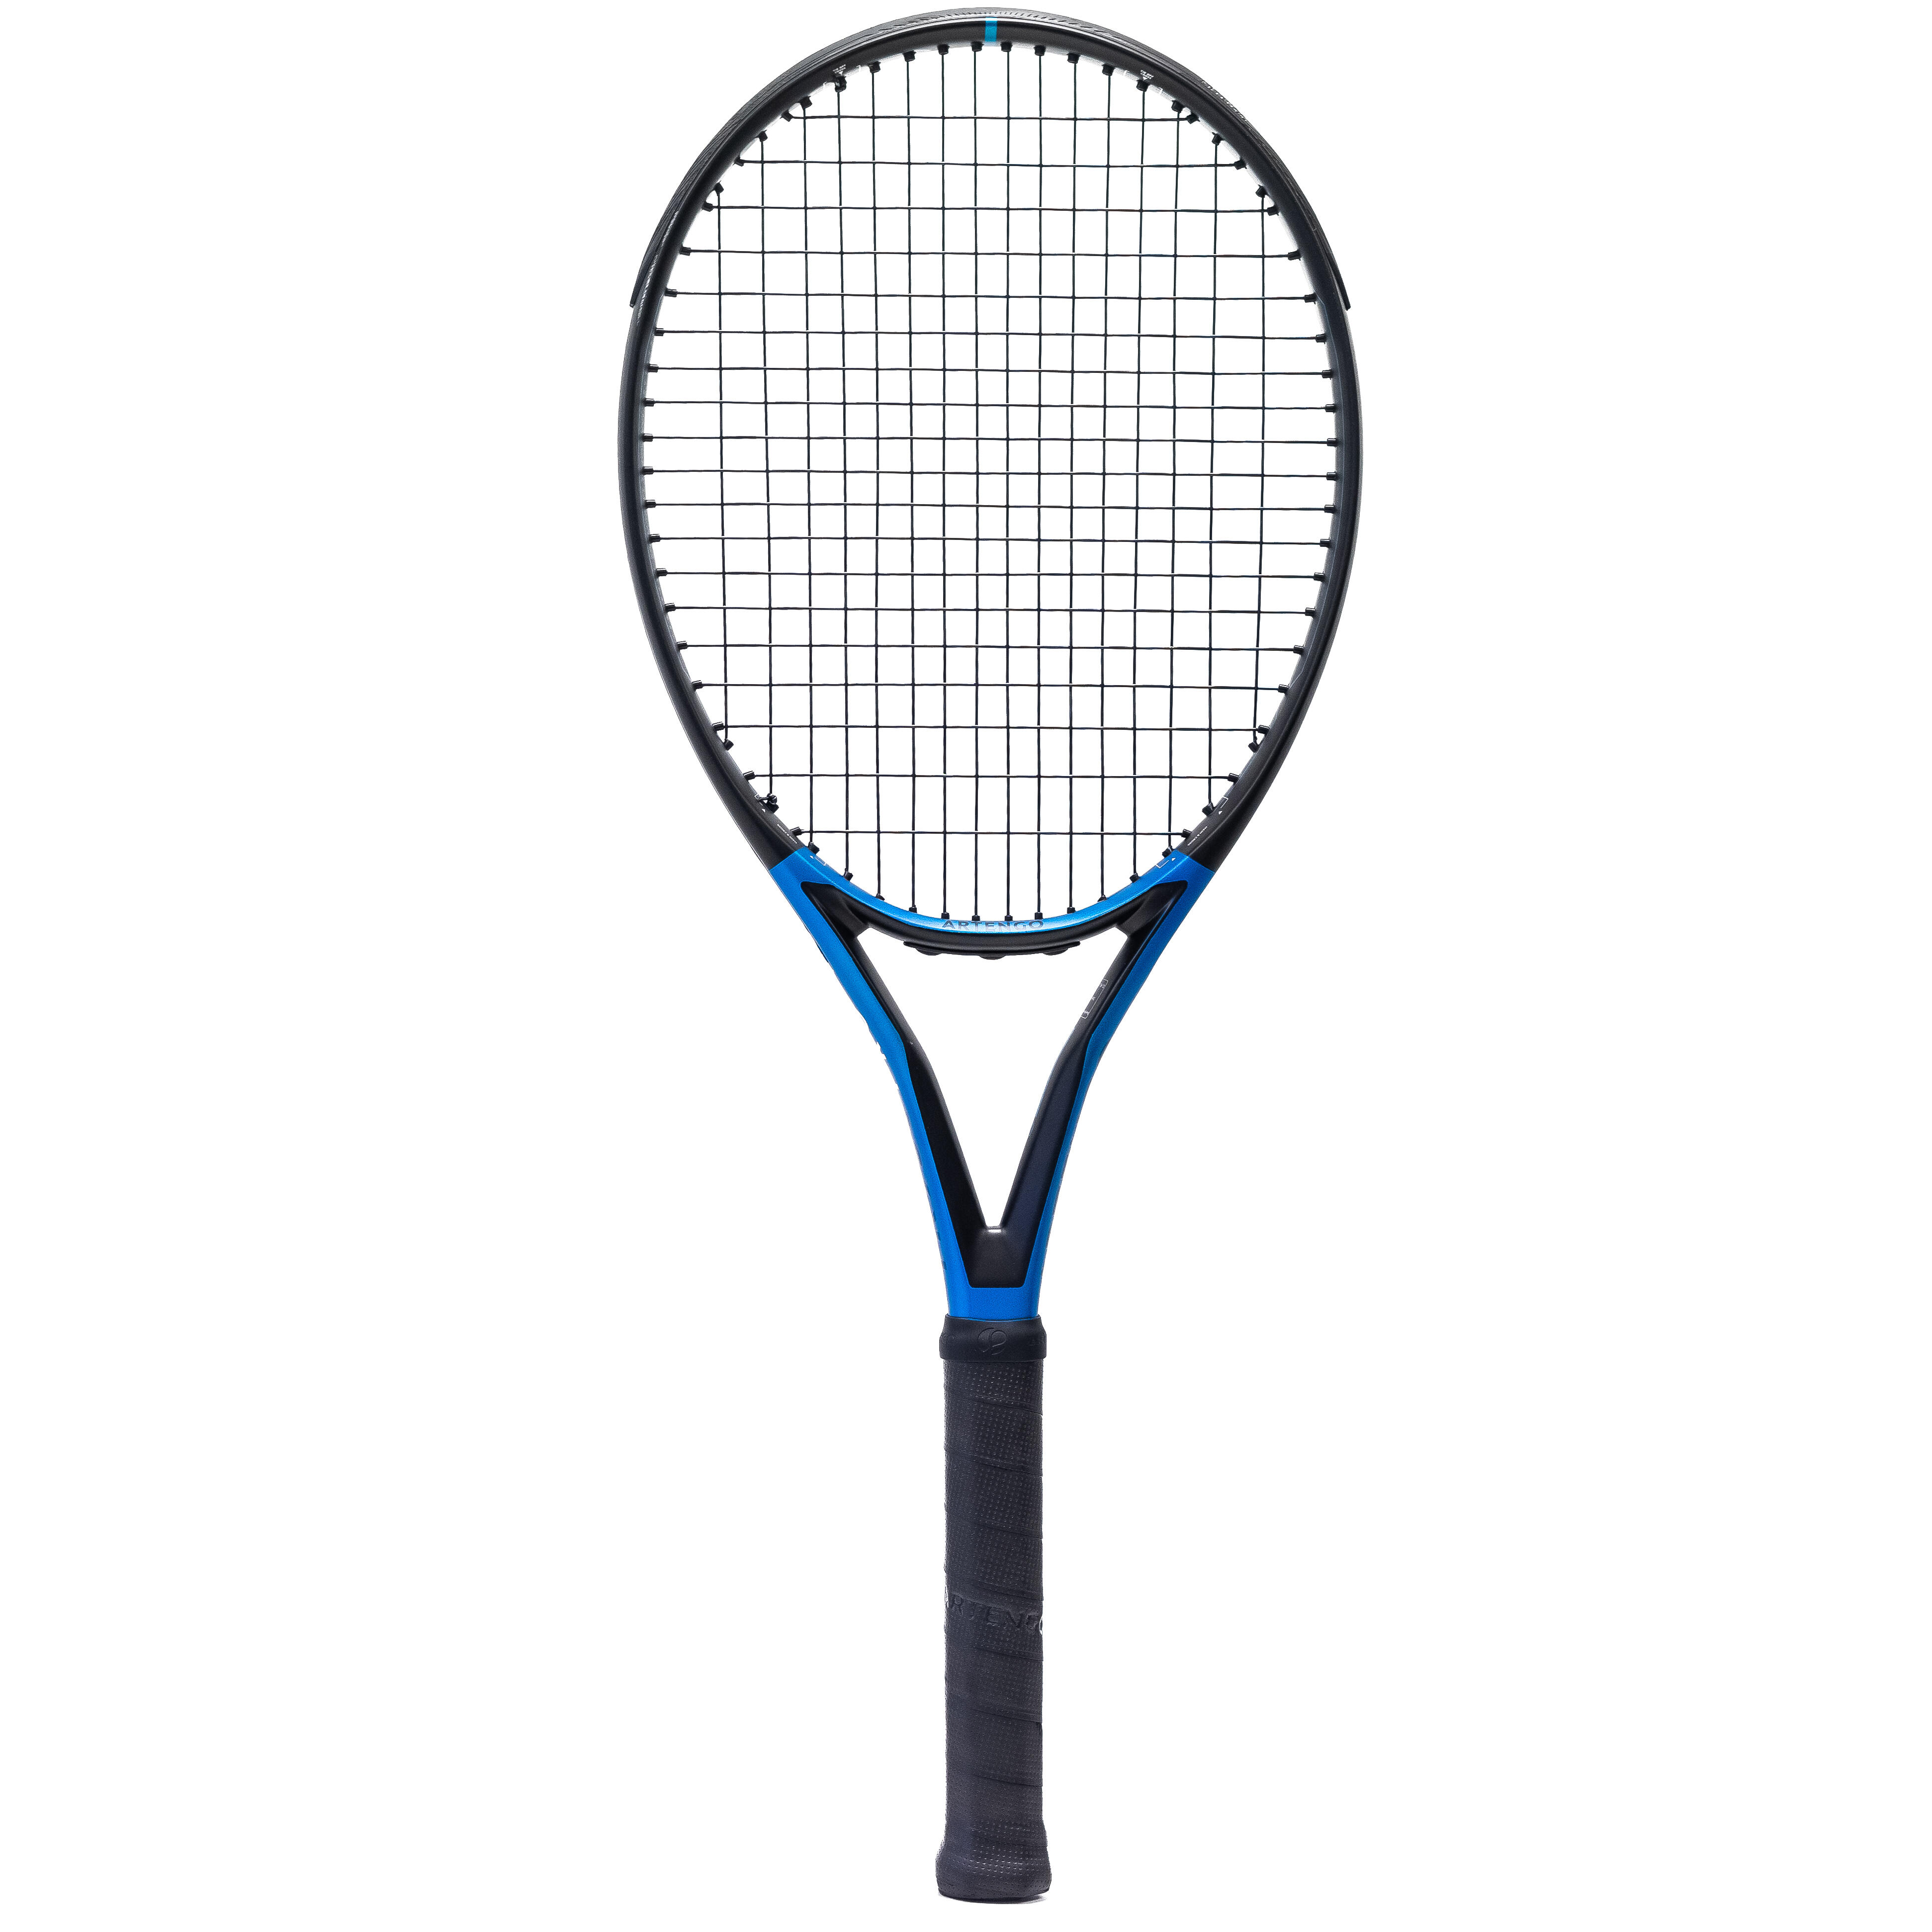 Rachetă Tenis TR930 SPIN PRO la Reducere poza